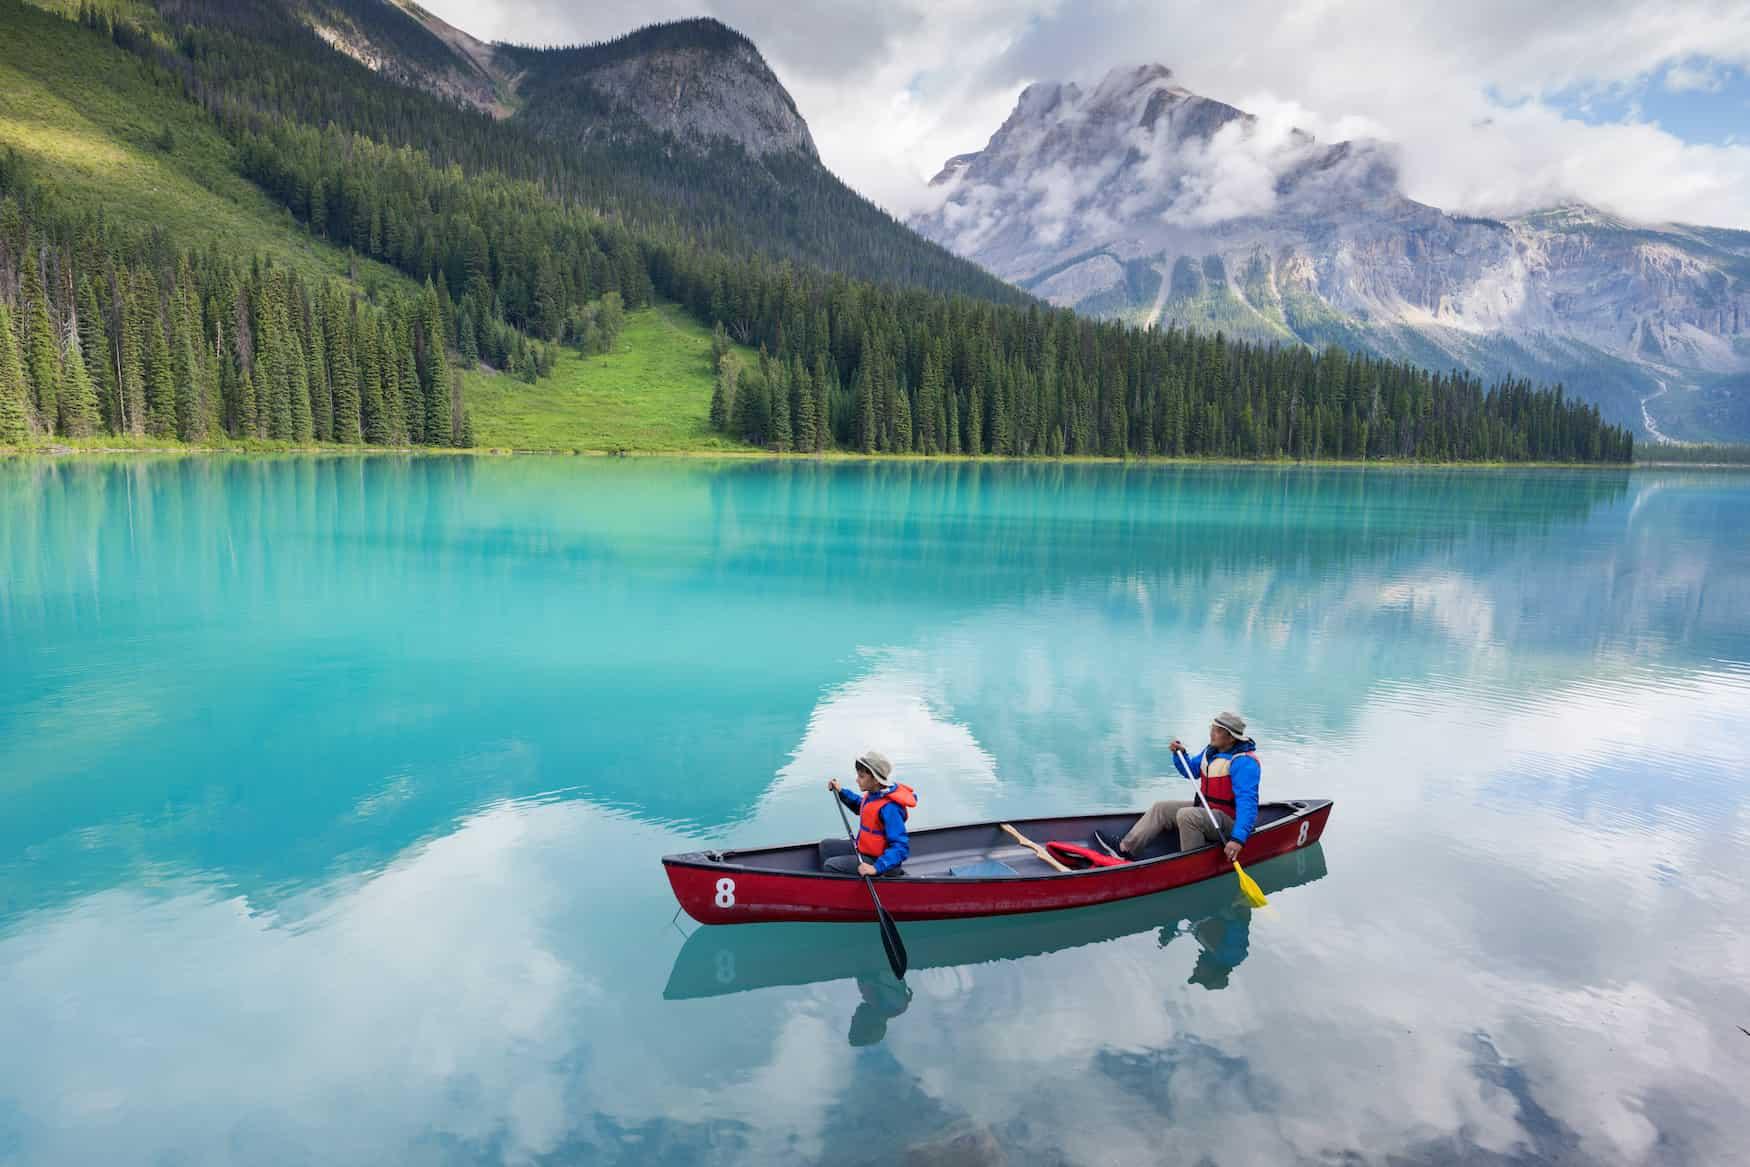 Kanu auf dem Emerald Lake, Yoho National Park, British Columbia